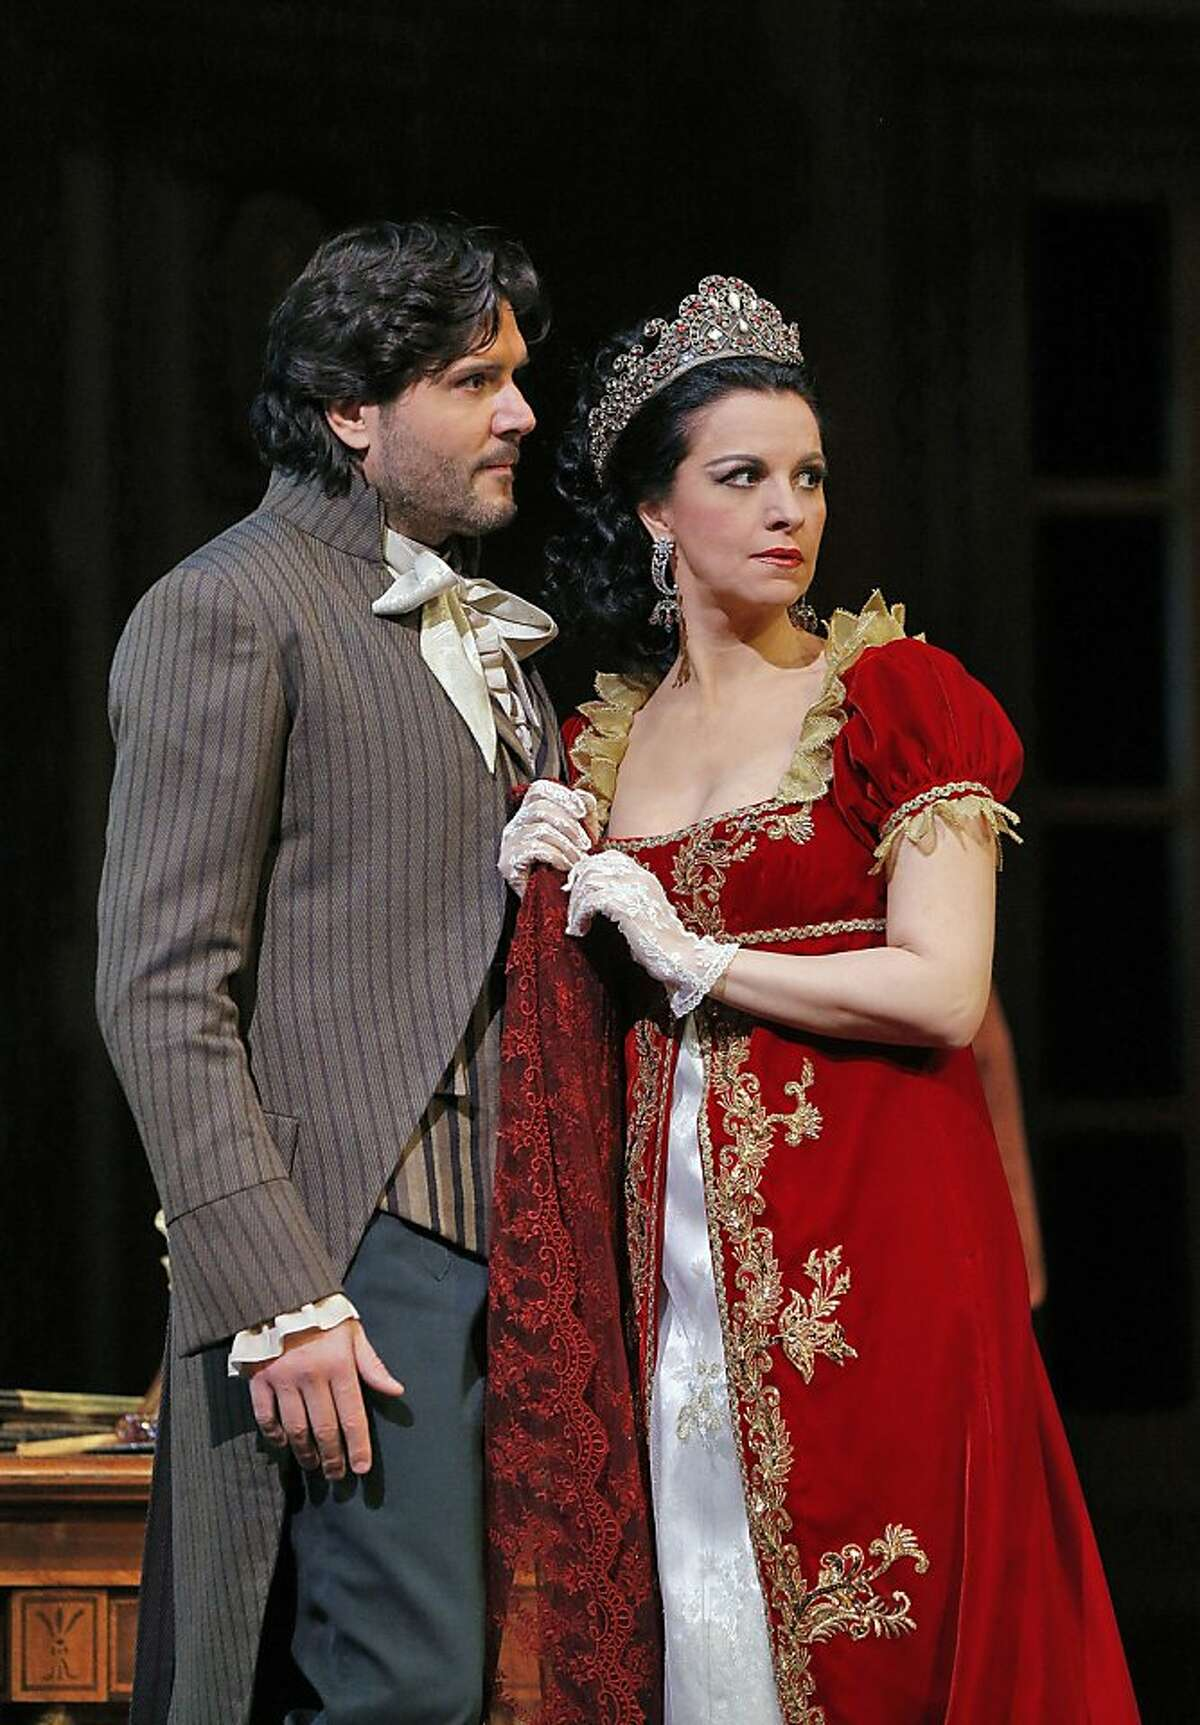 Tosca Act II Massimo Giordano (Cavaradossi) and Angela Gheorghiu (Tosca).